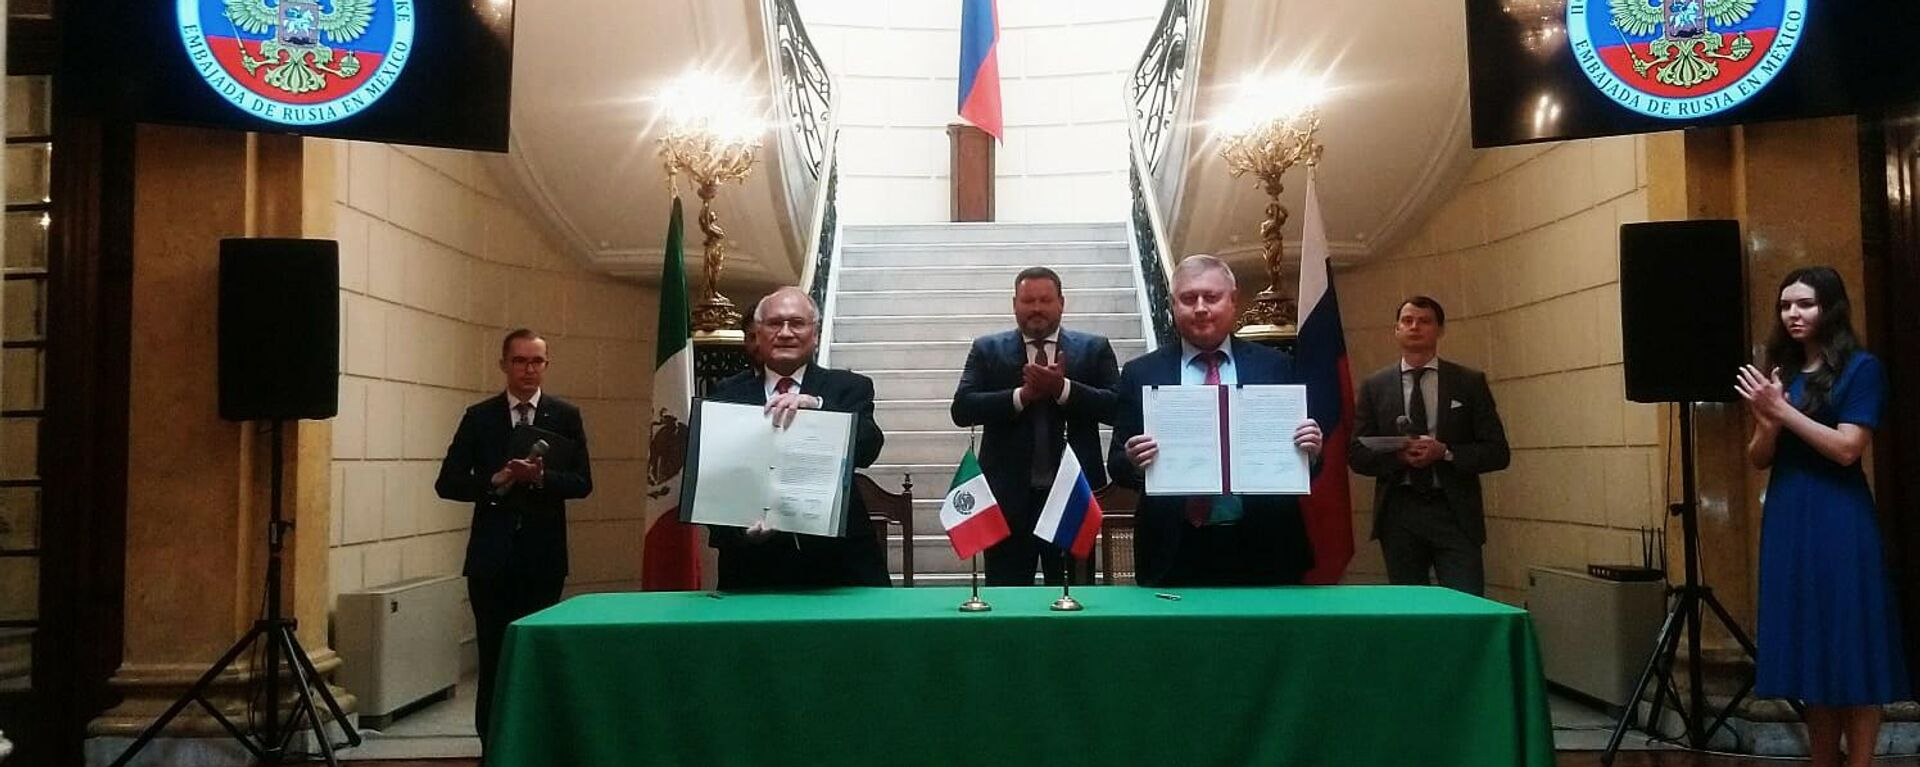 Acuerdo espacial entre Rusia y México - Sputnik Mundo, 1920, 29.09.2021